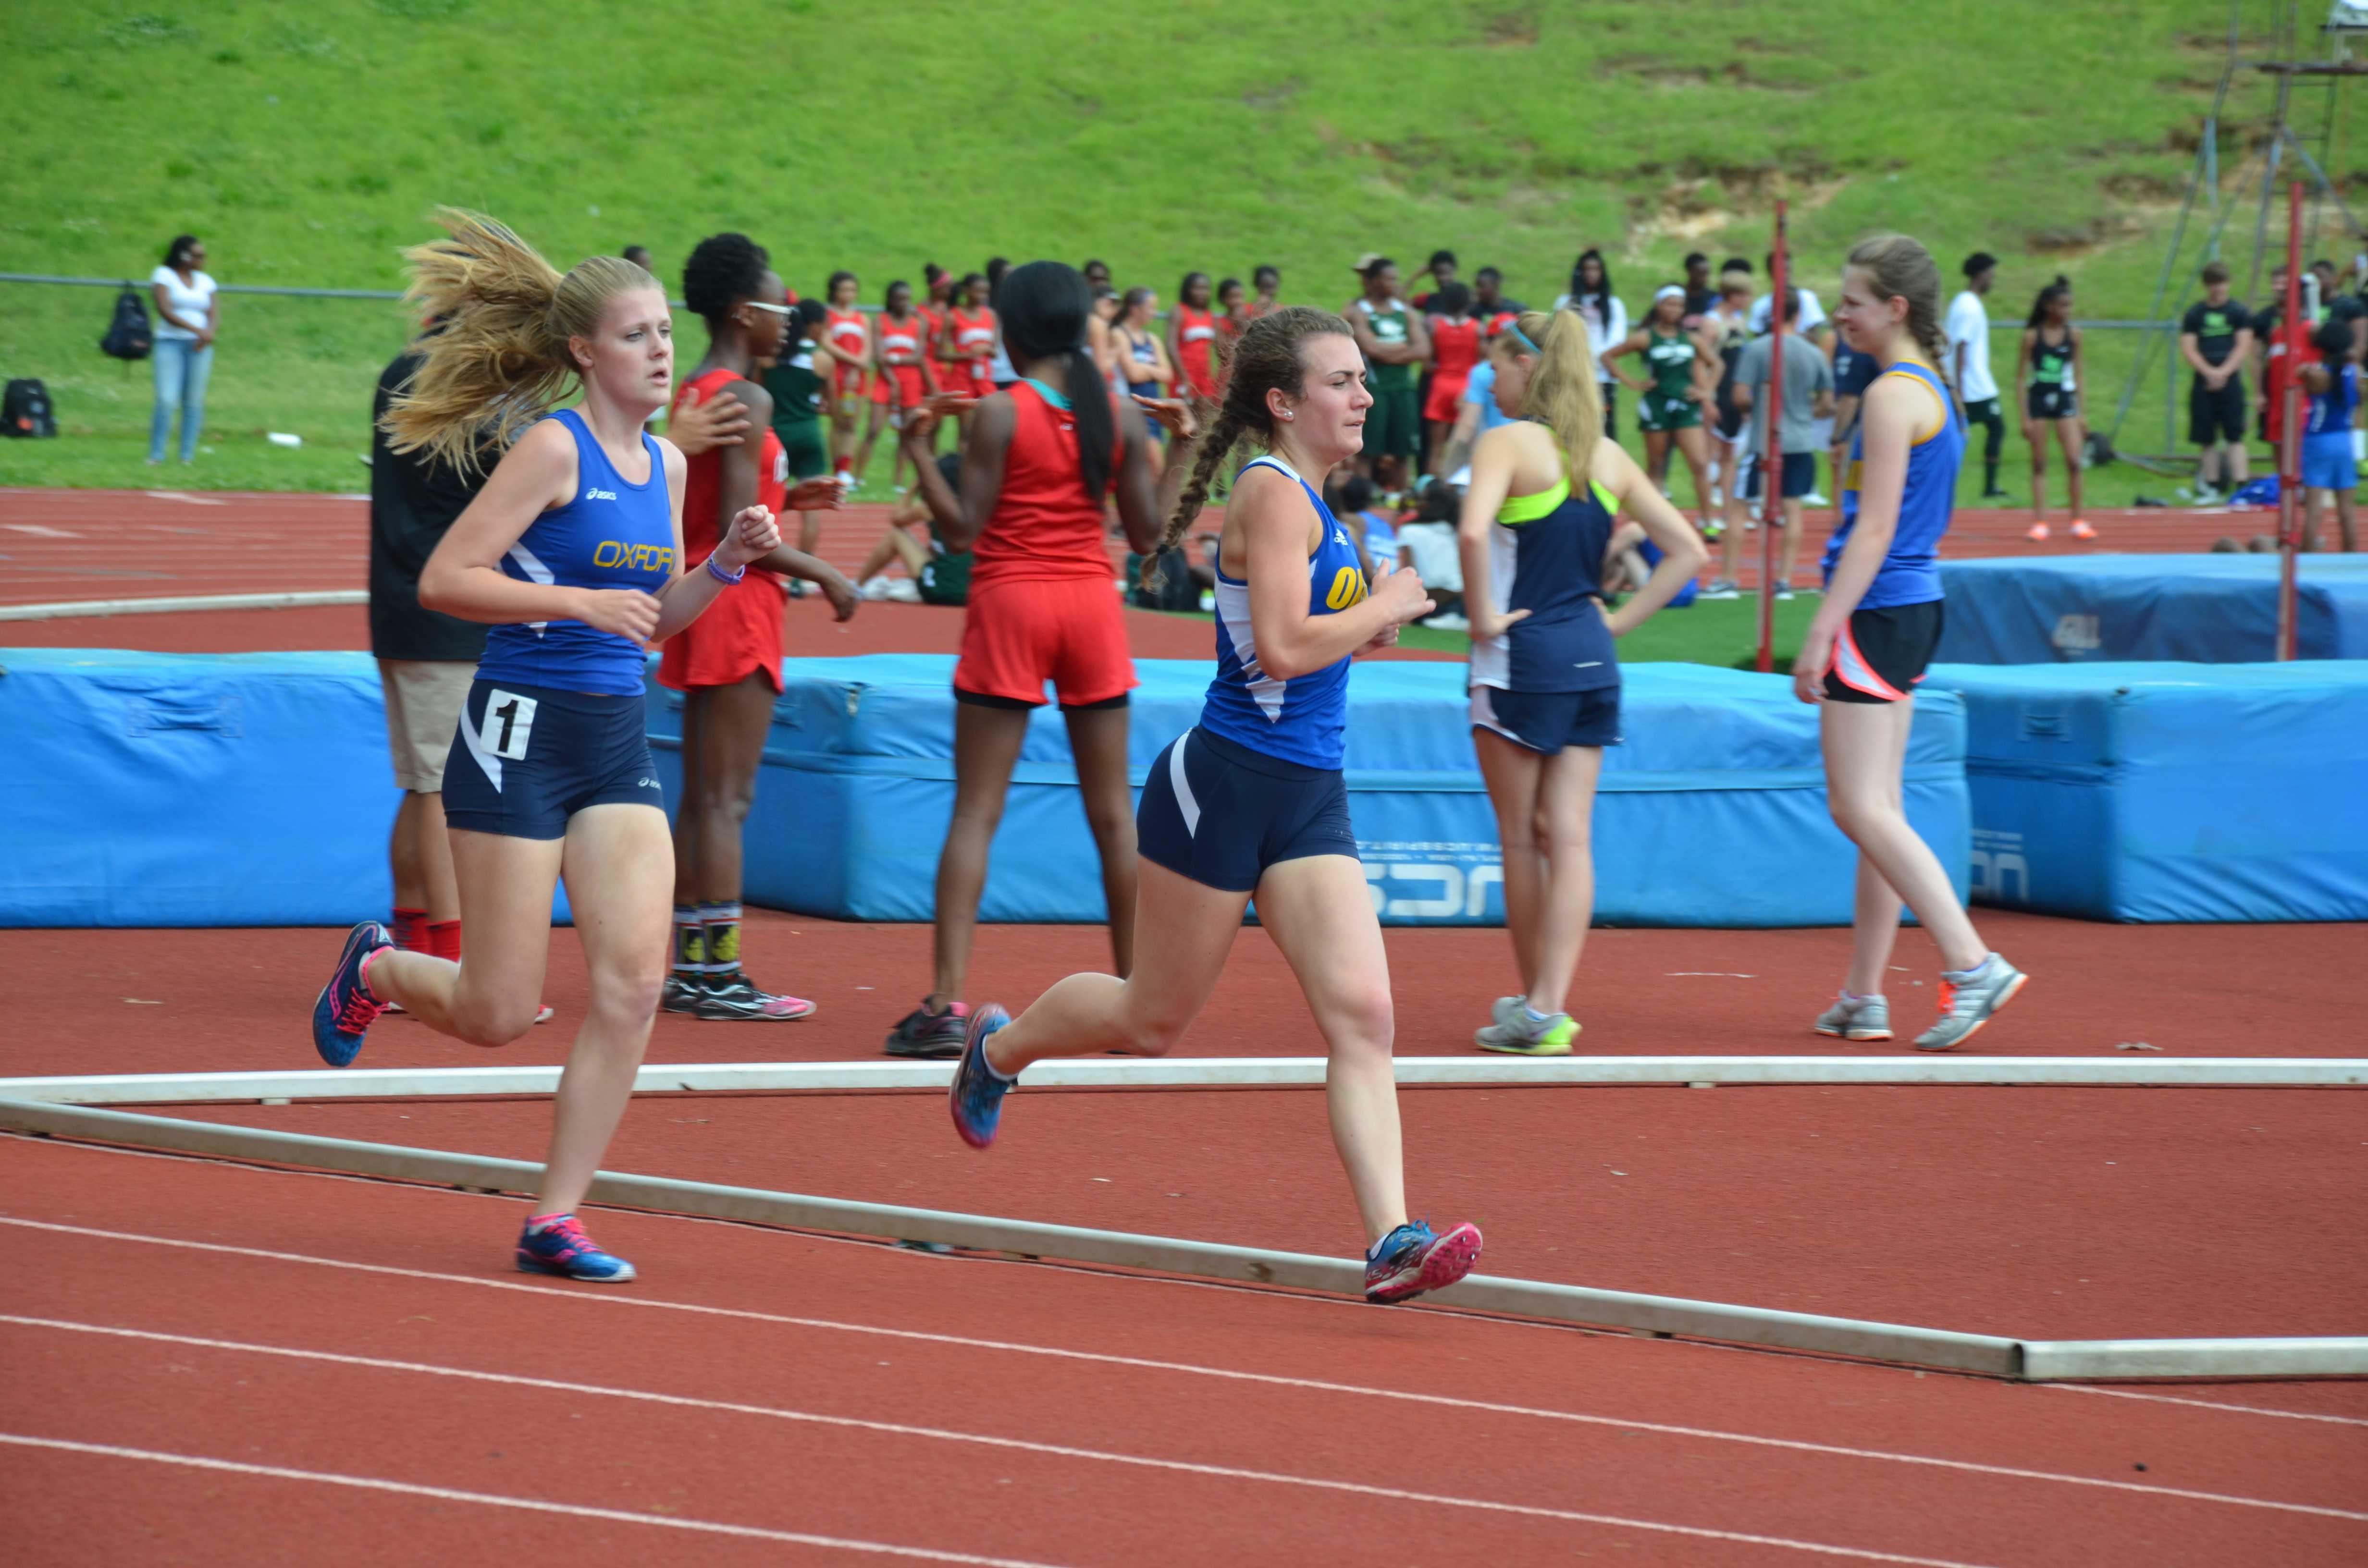 Margaret+Pepper+Adams+%26amp%3B+Emily+Hankins+run+the+girls%27+3200+meter.+